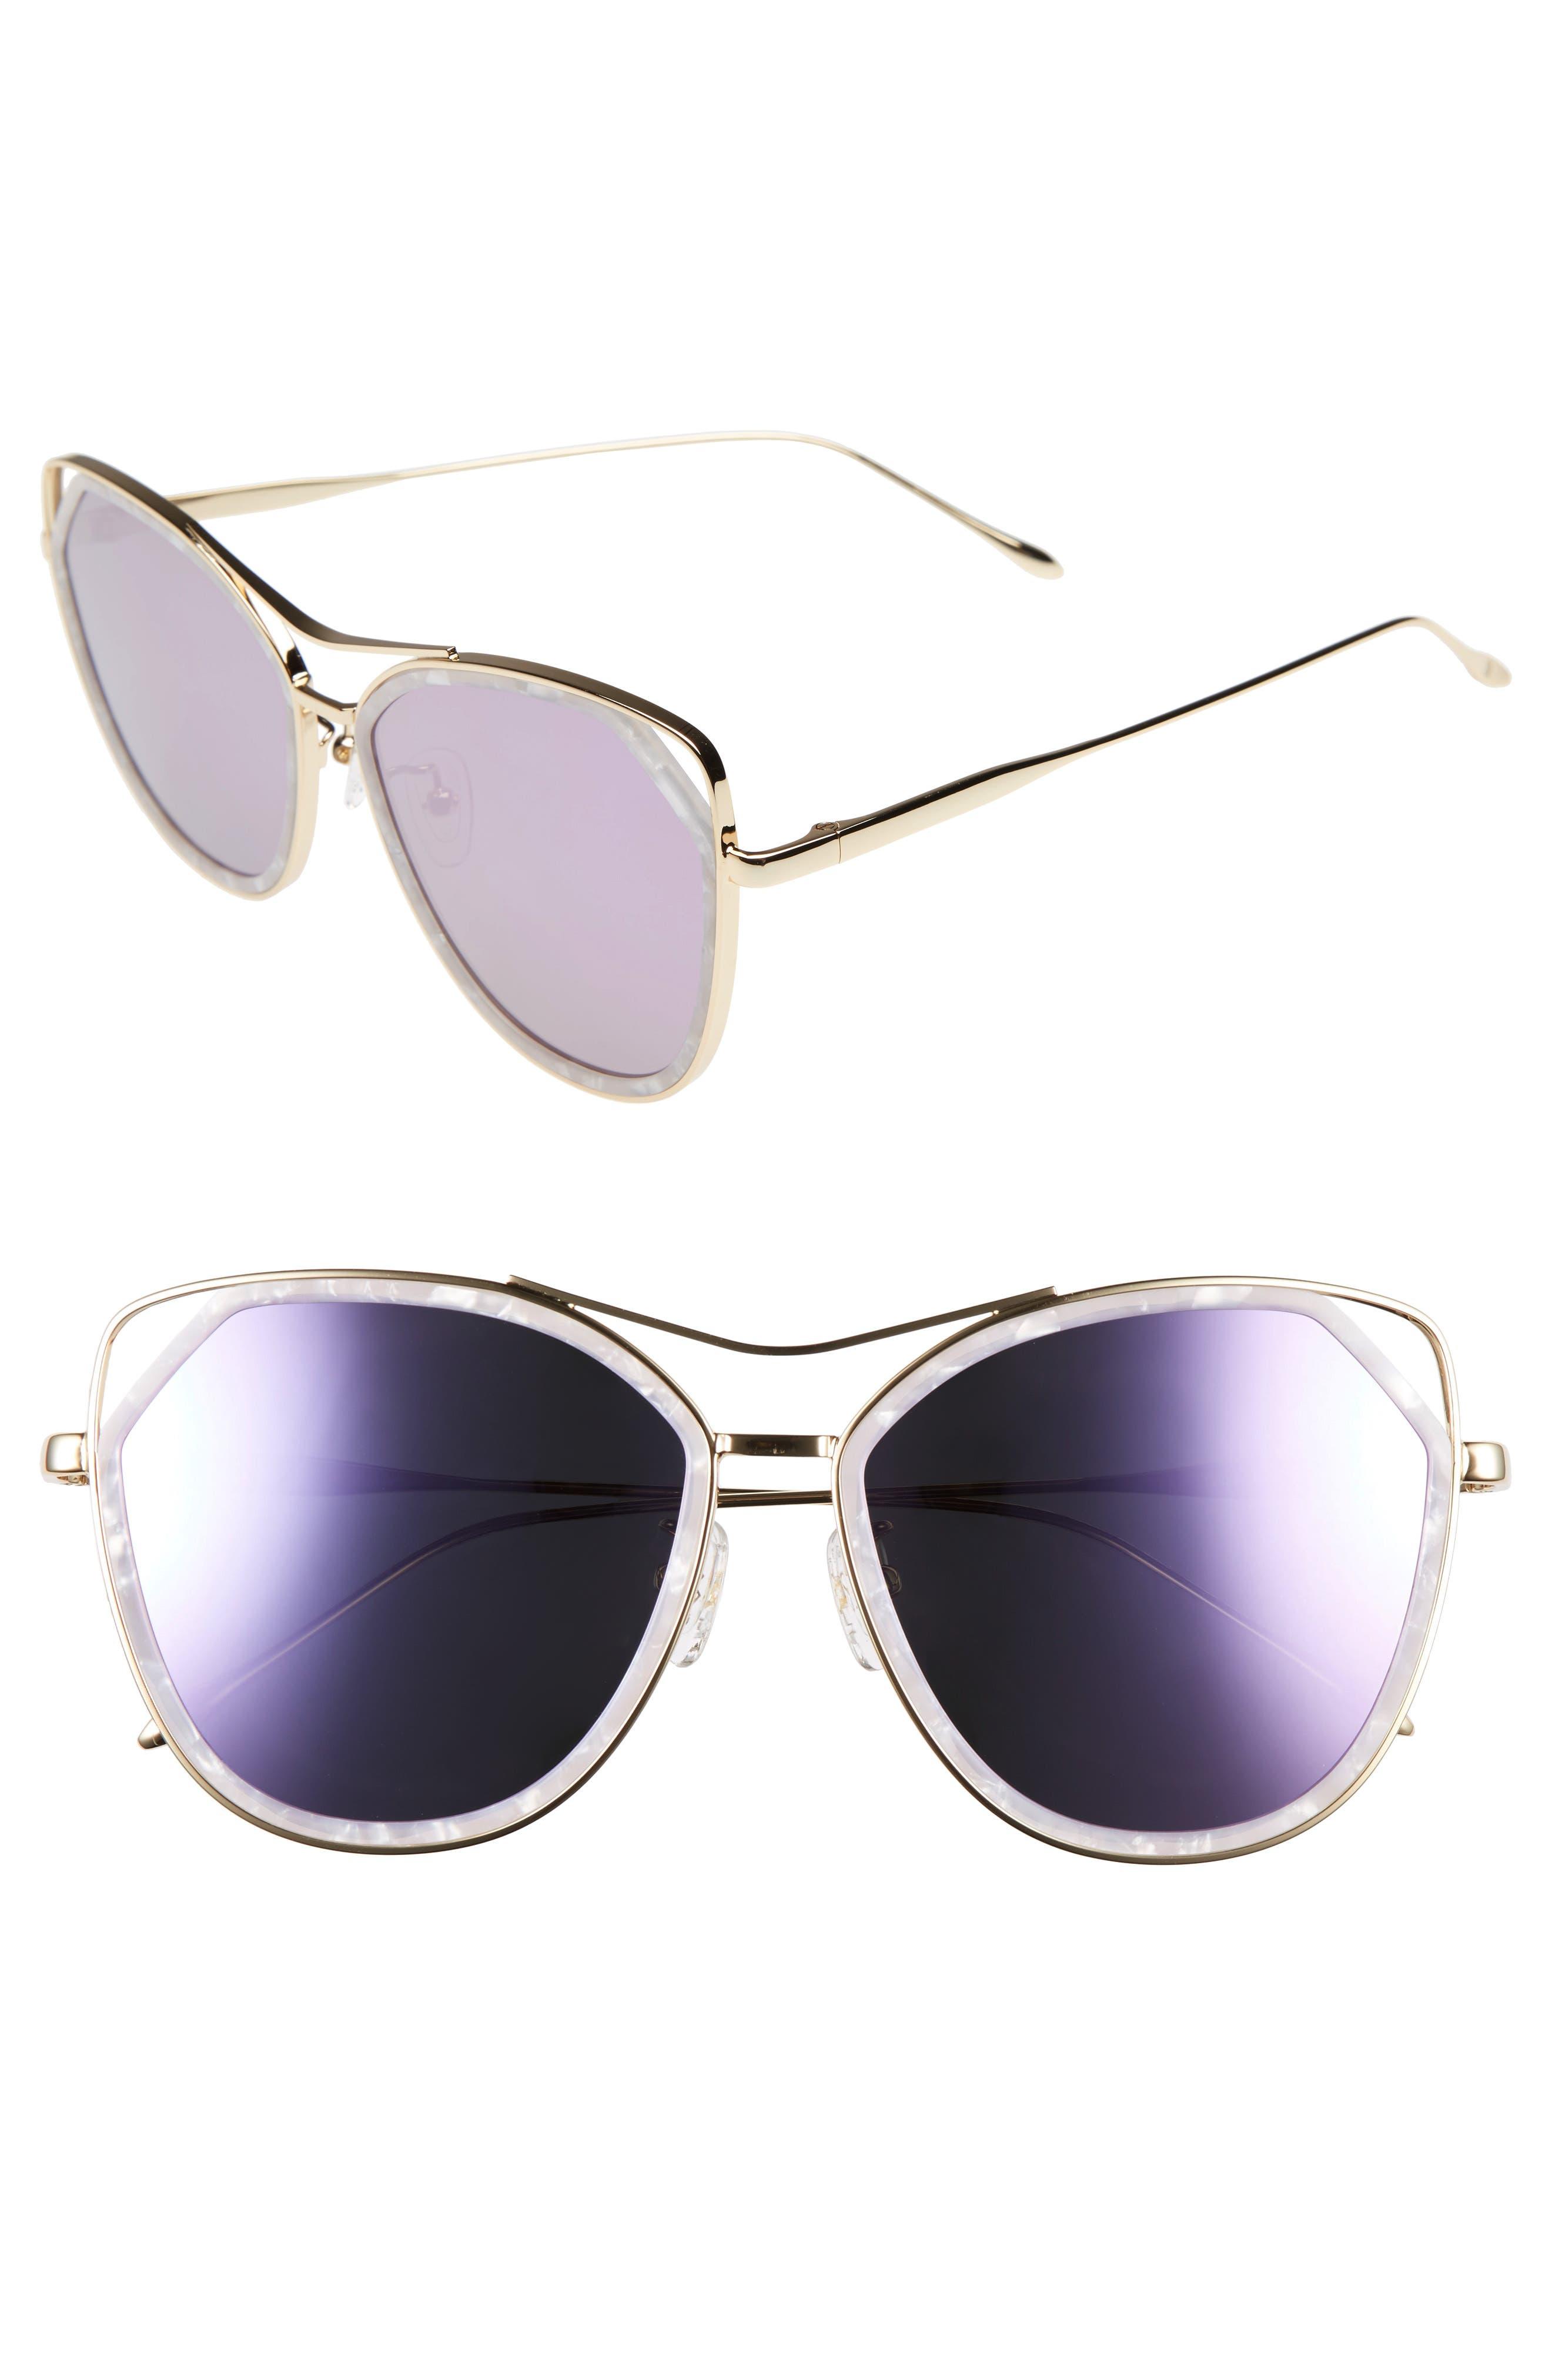 Grand 56mm Polarized Cat Eye Sunglasses,                             Main thumbnail 1, color,                             Lavender